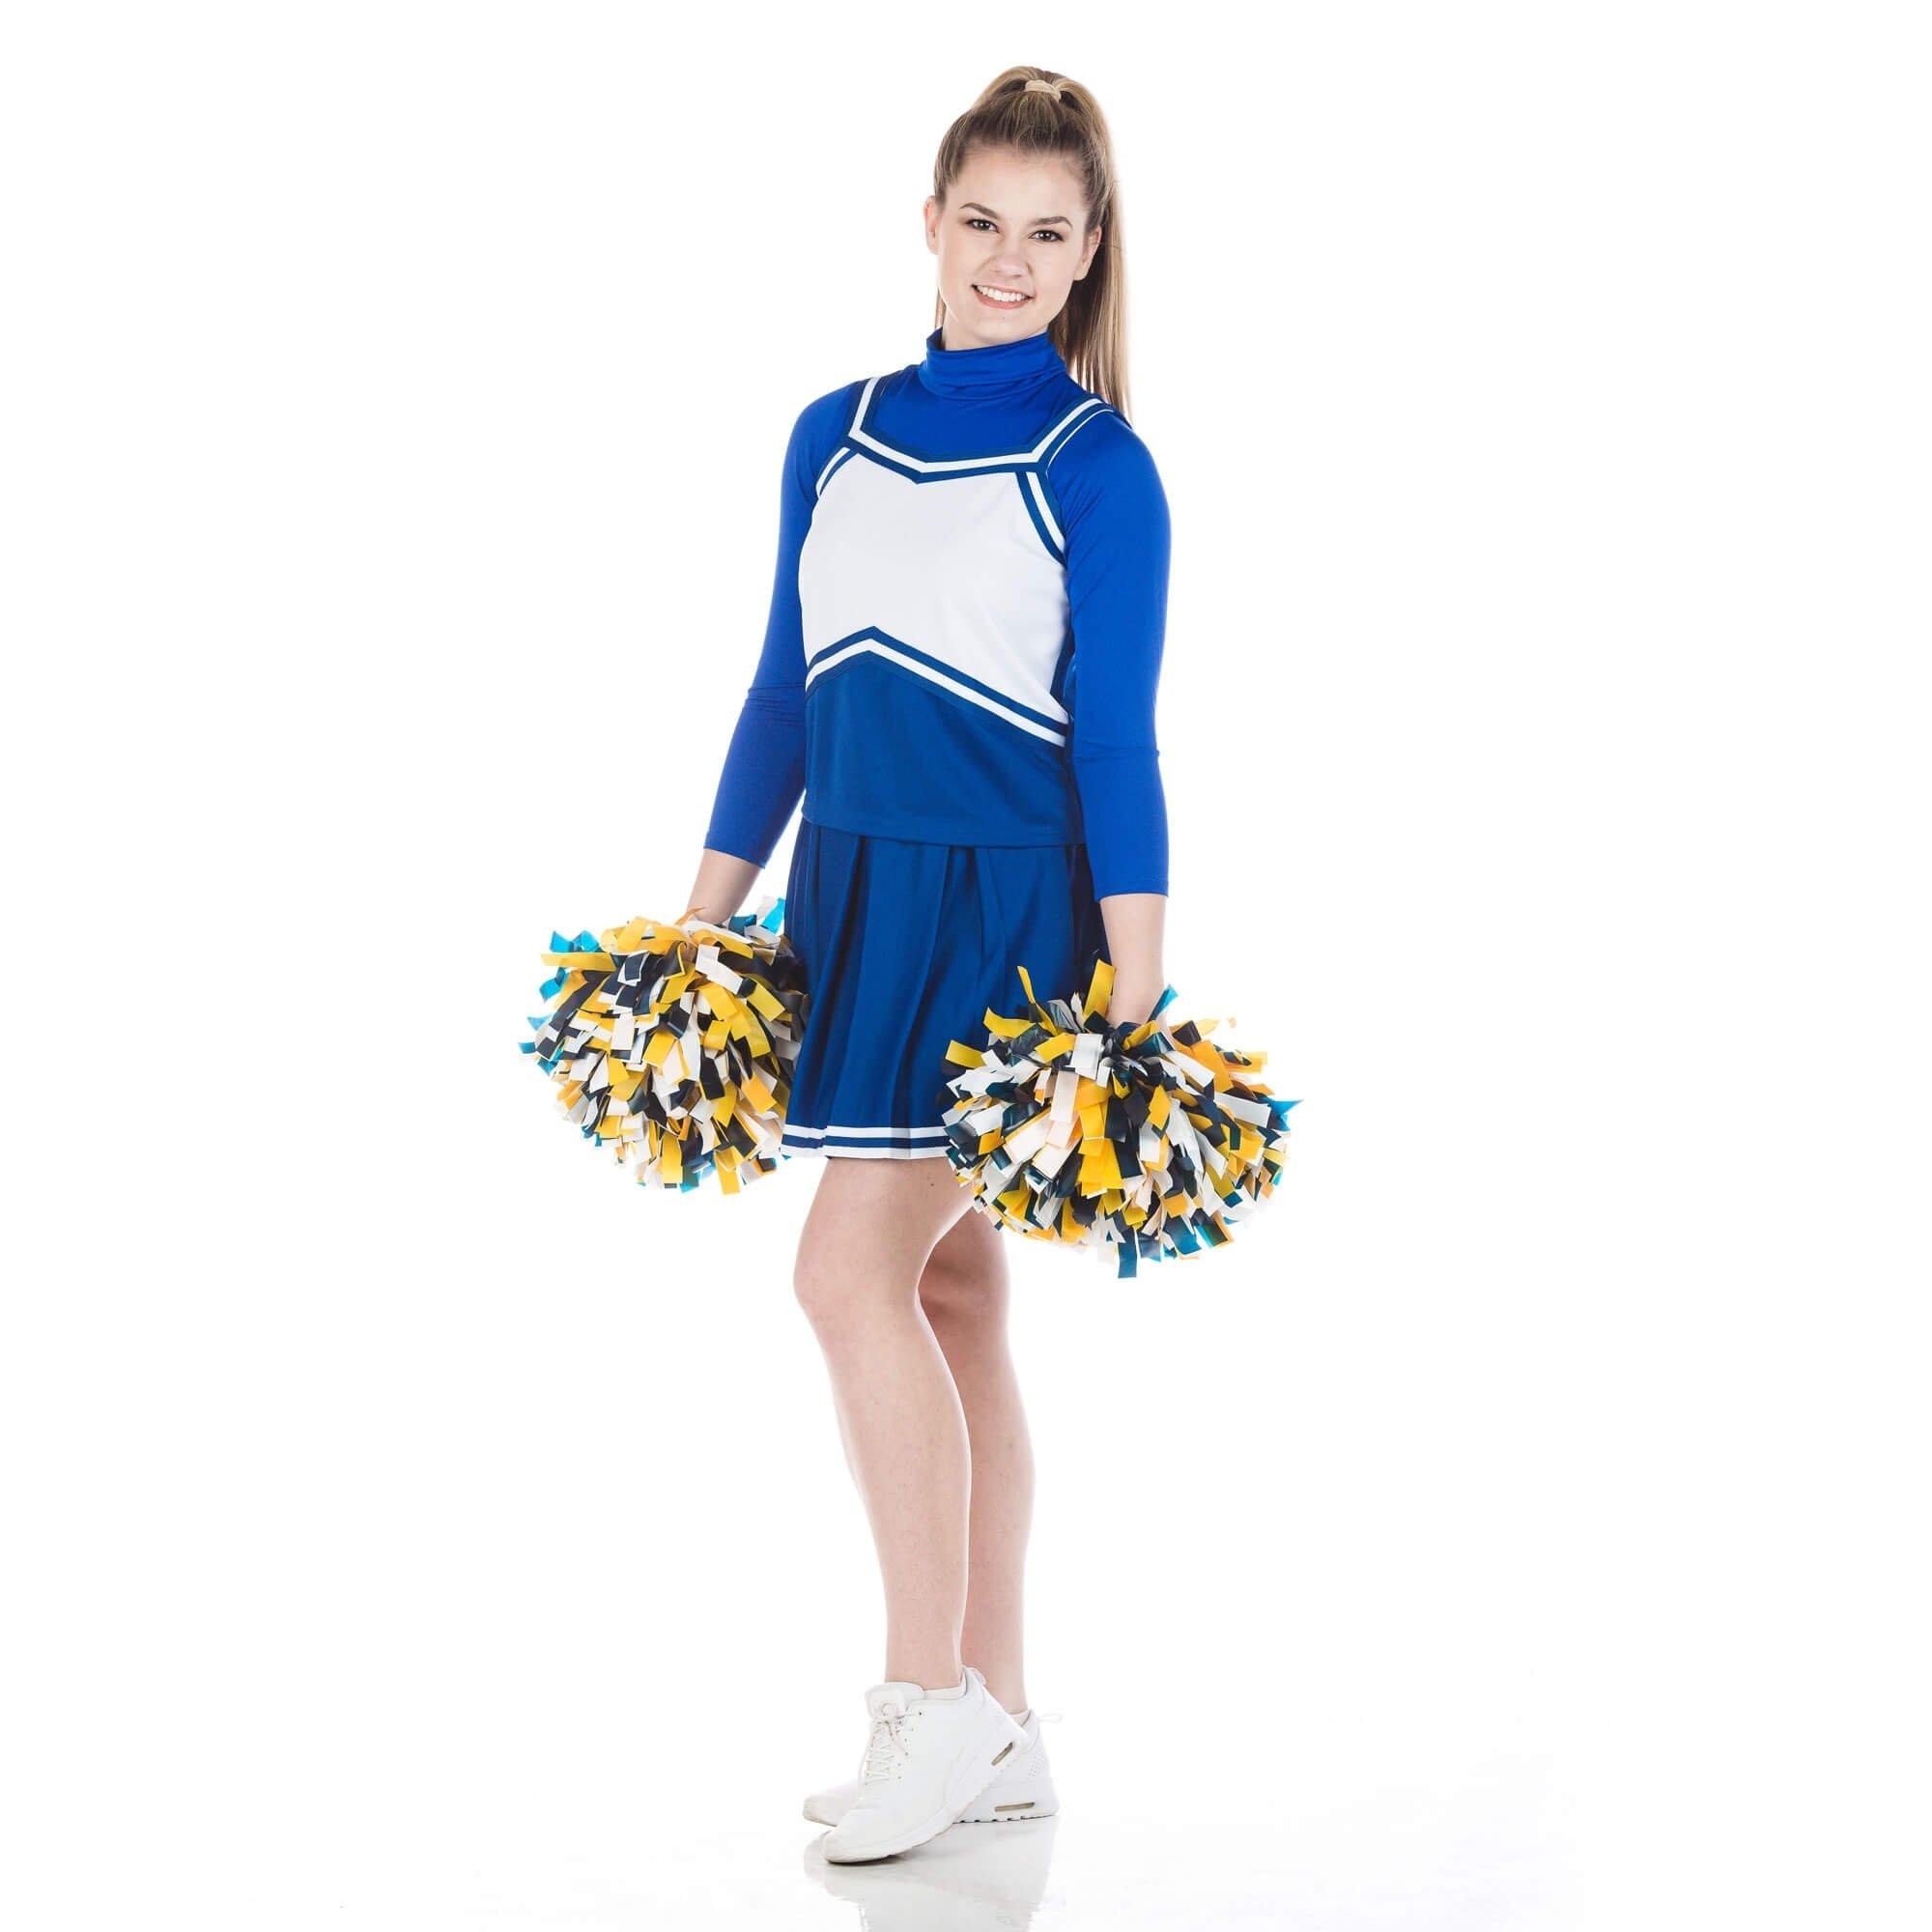 cheer instock uniforms sets cheerleading uniforms dance